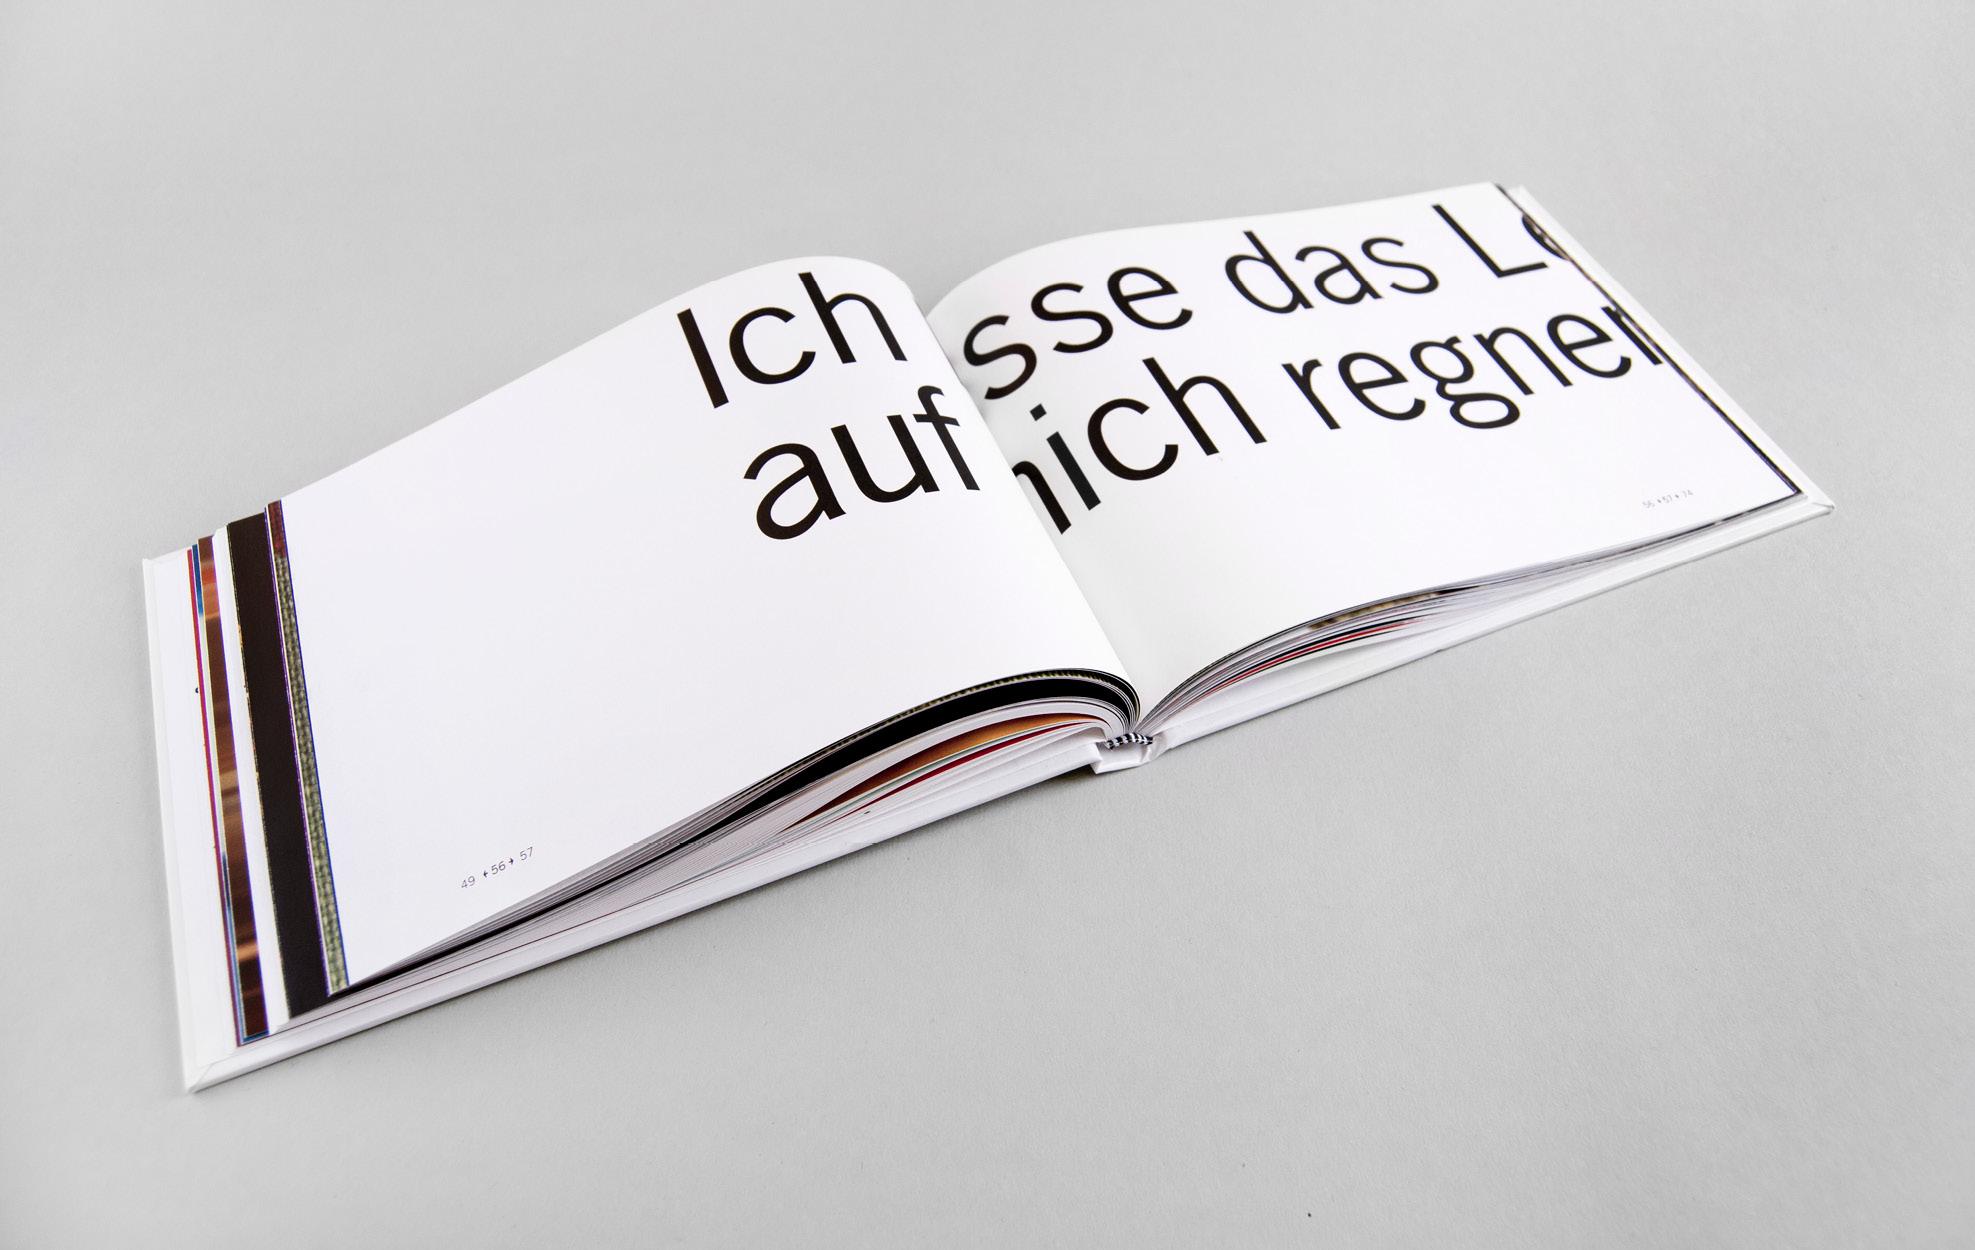 editorial-design_schneegestoeber9